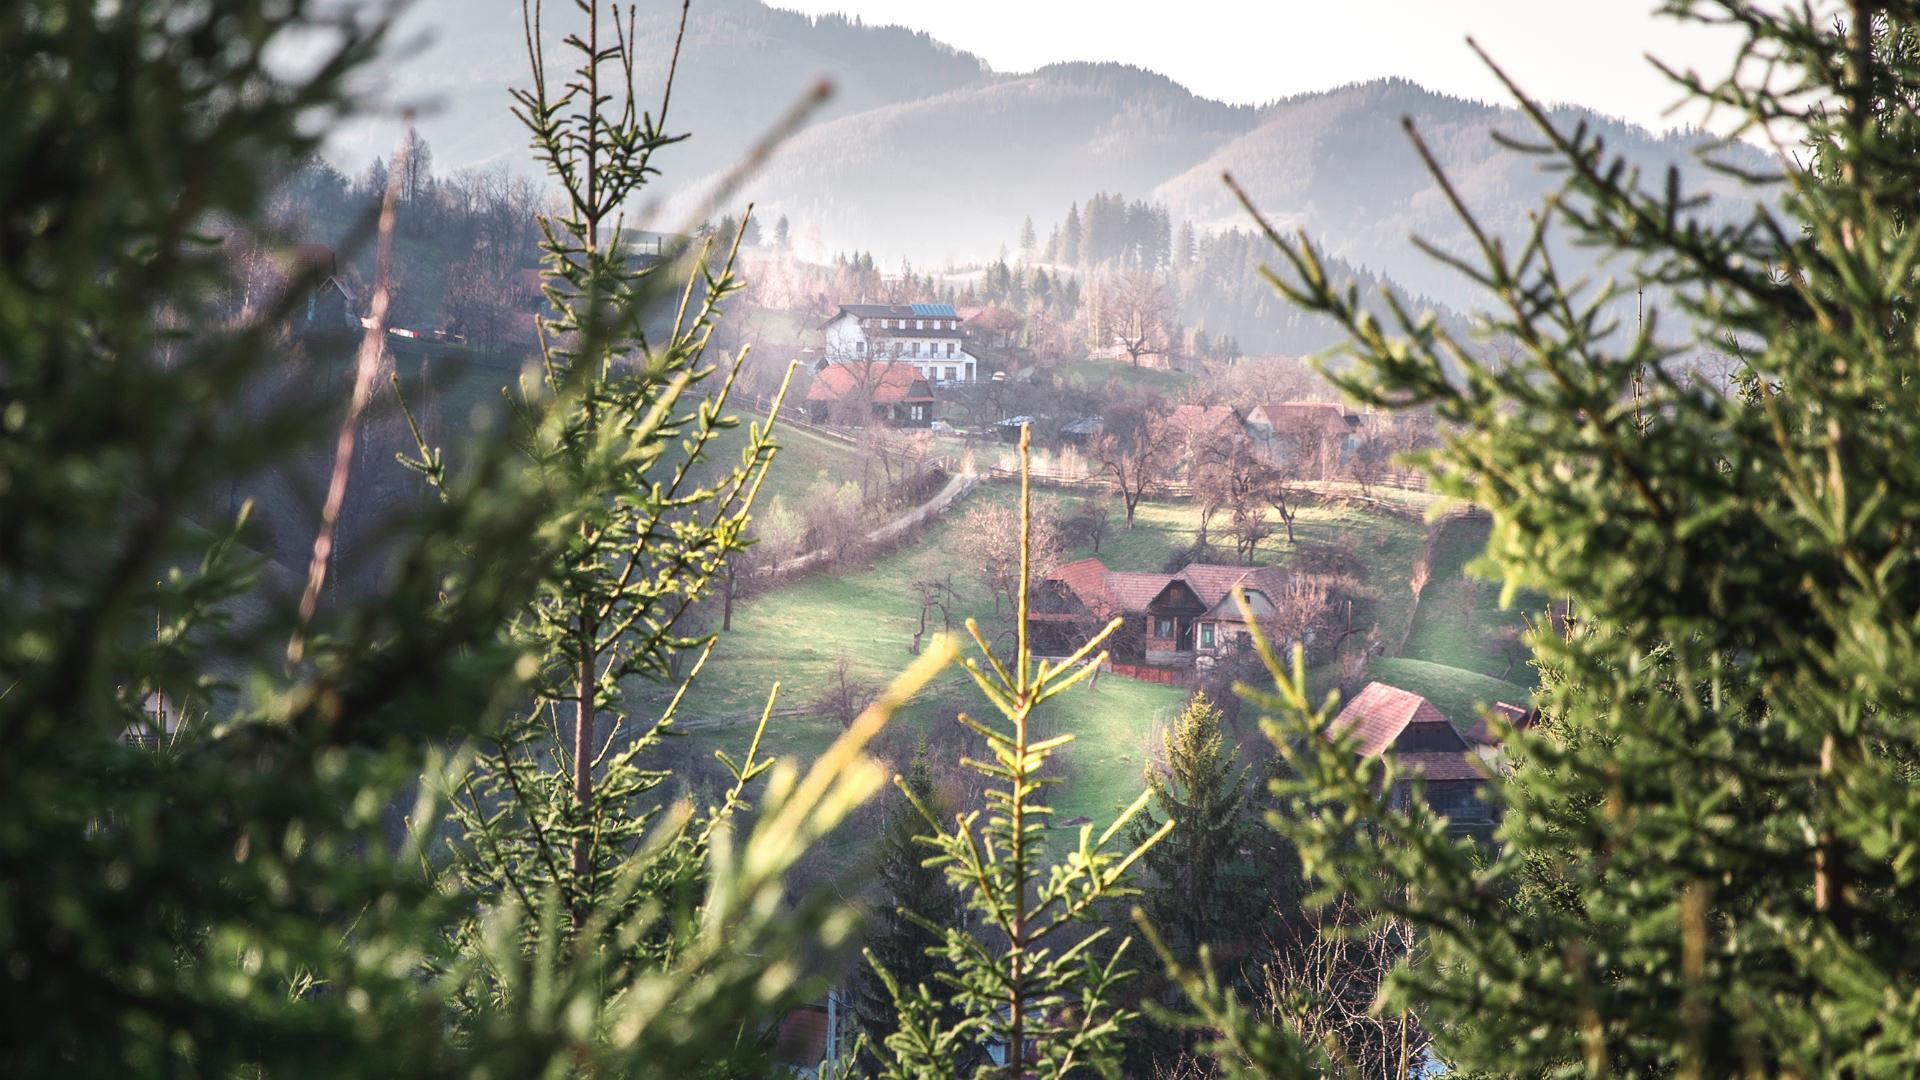 Romanya:Kont Drakula'ya Kısa Bir Ziyaret